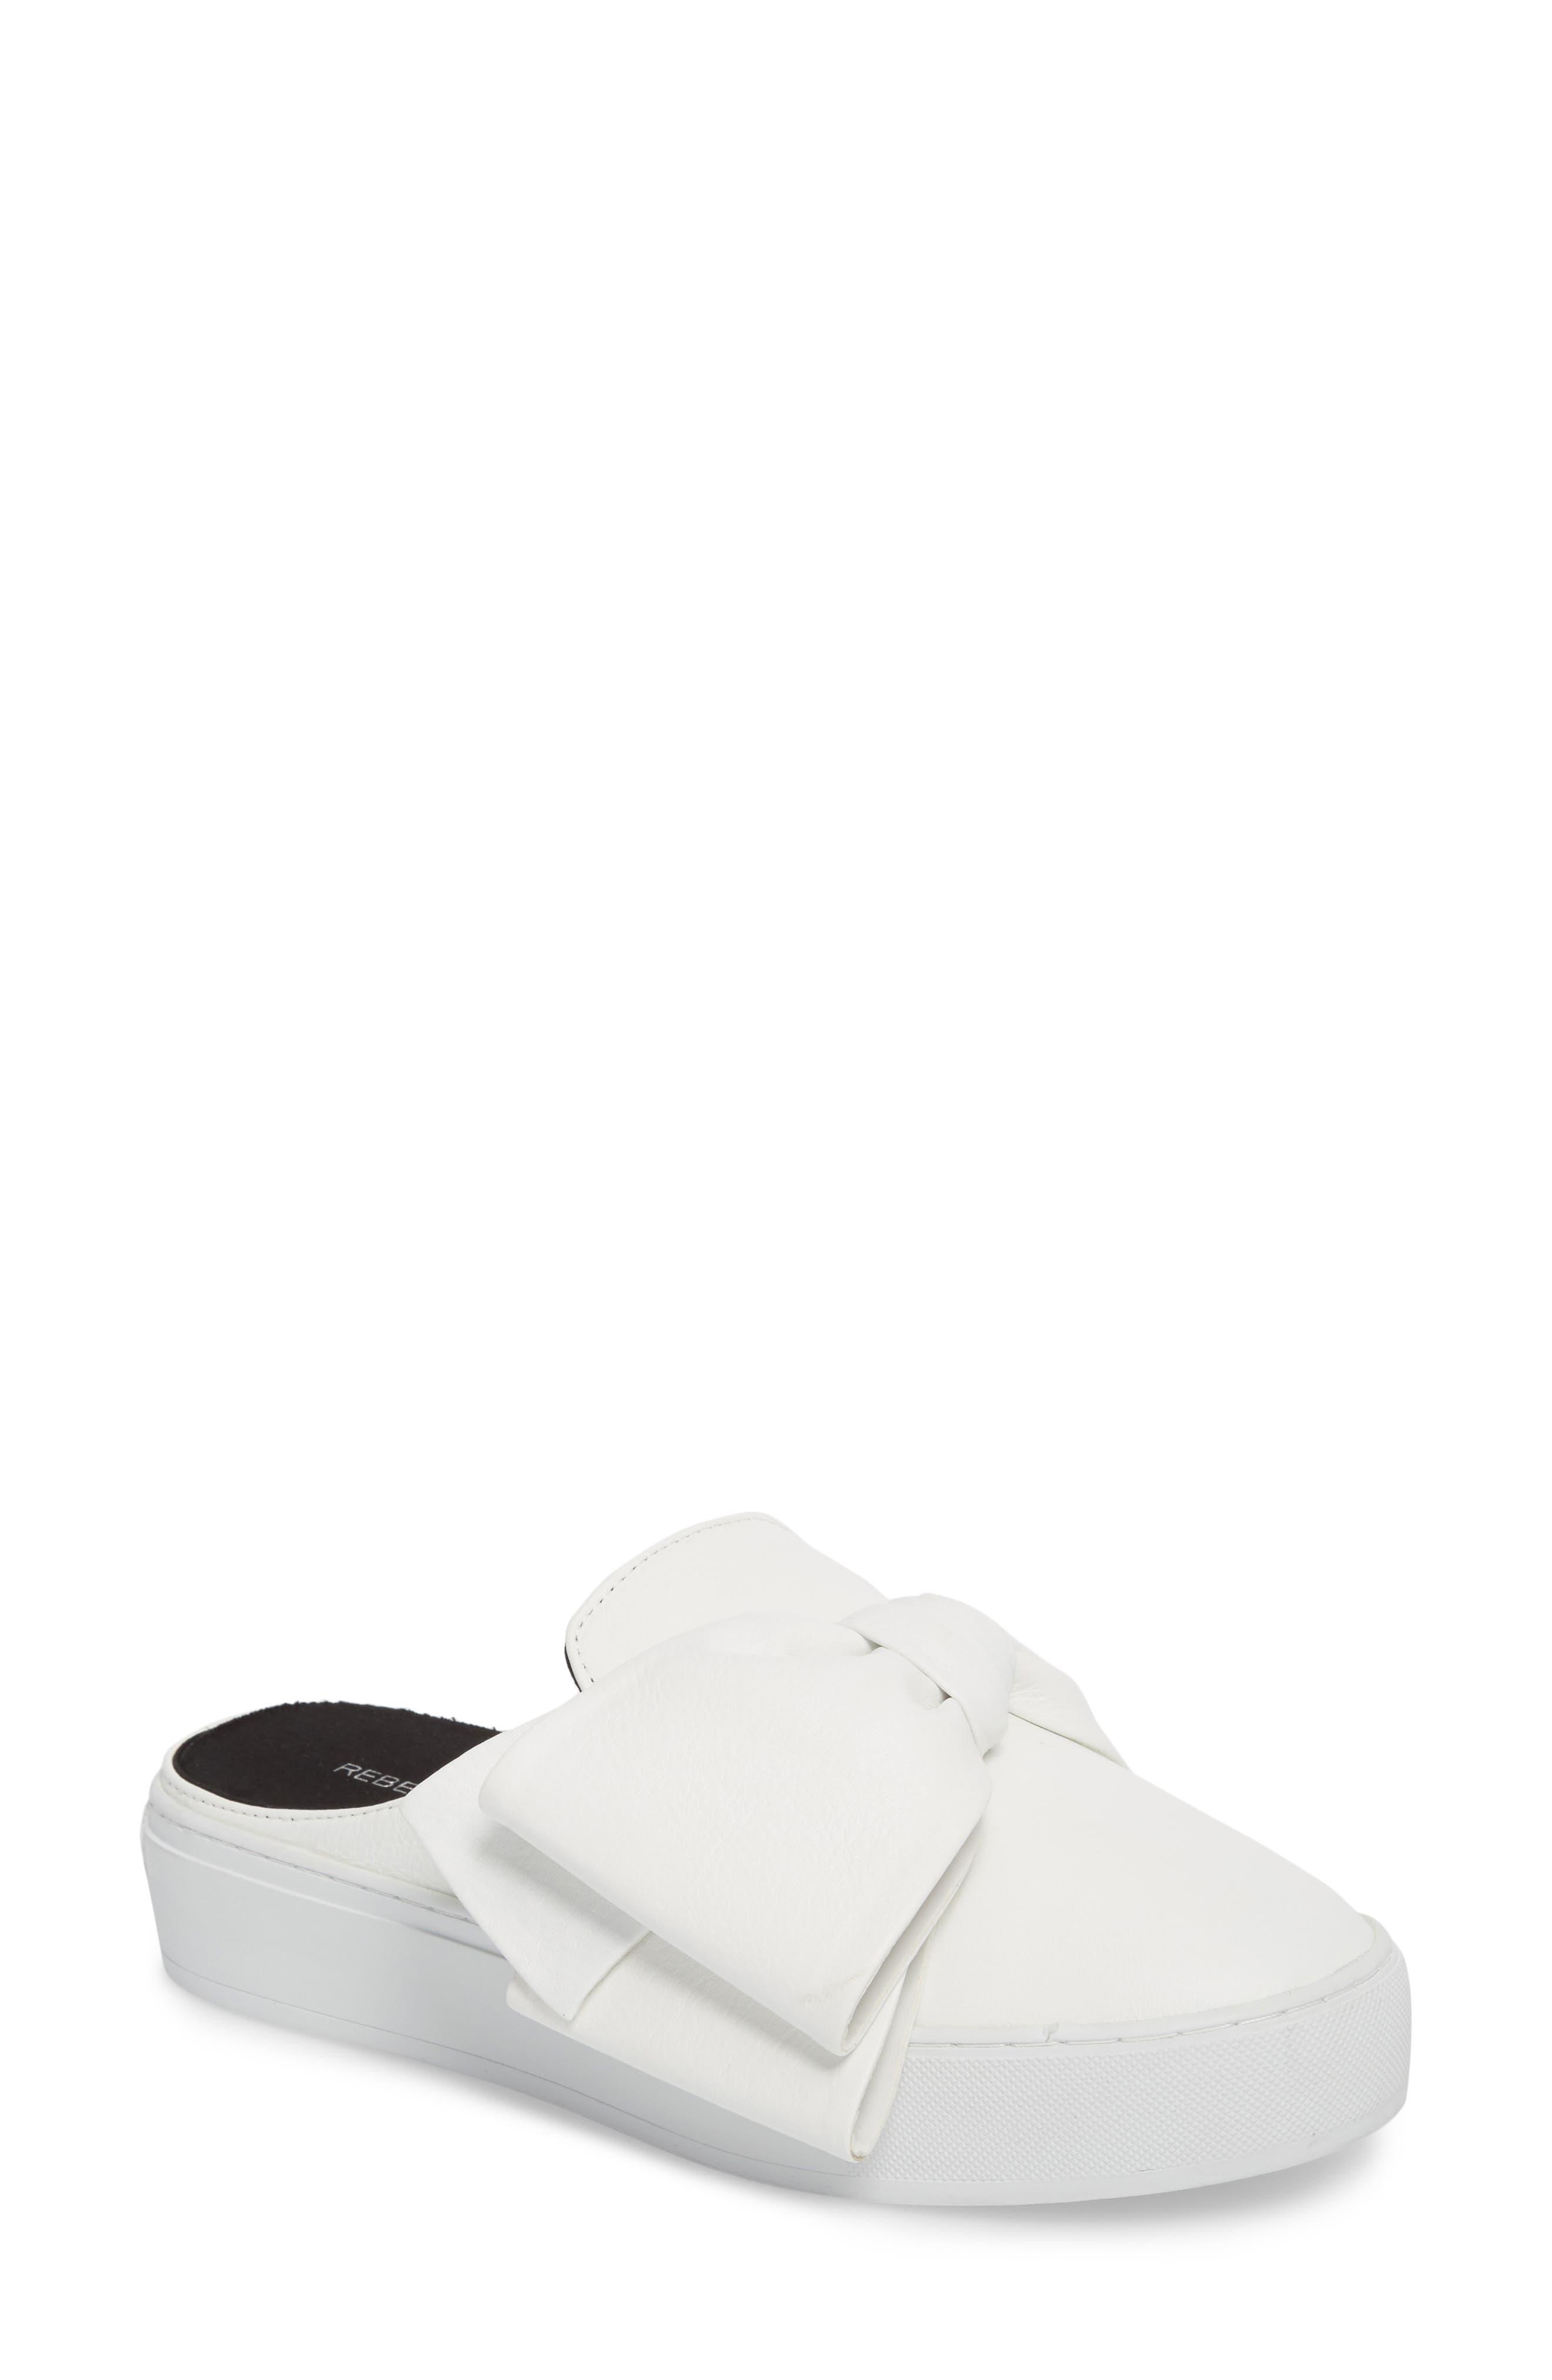 Neva Sneaker Mule,                         Main,                         color, Optic White Leather